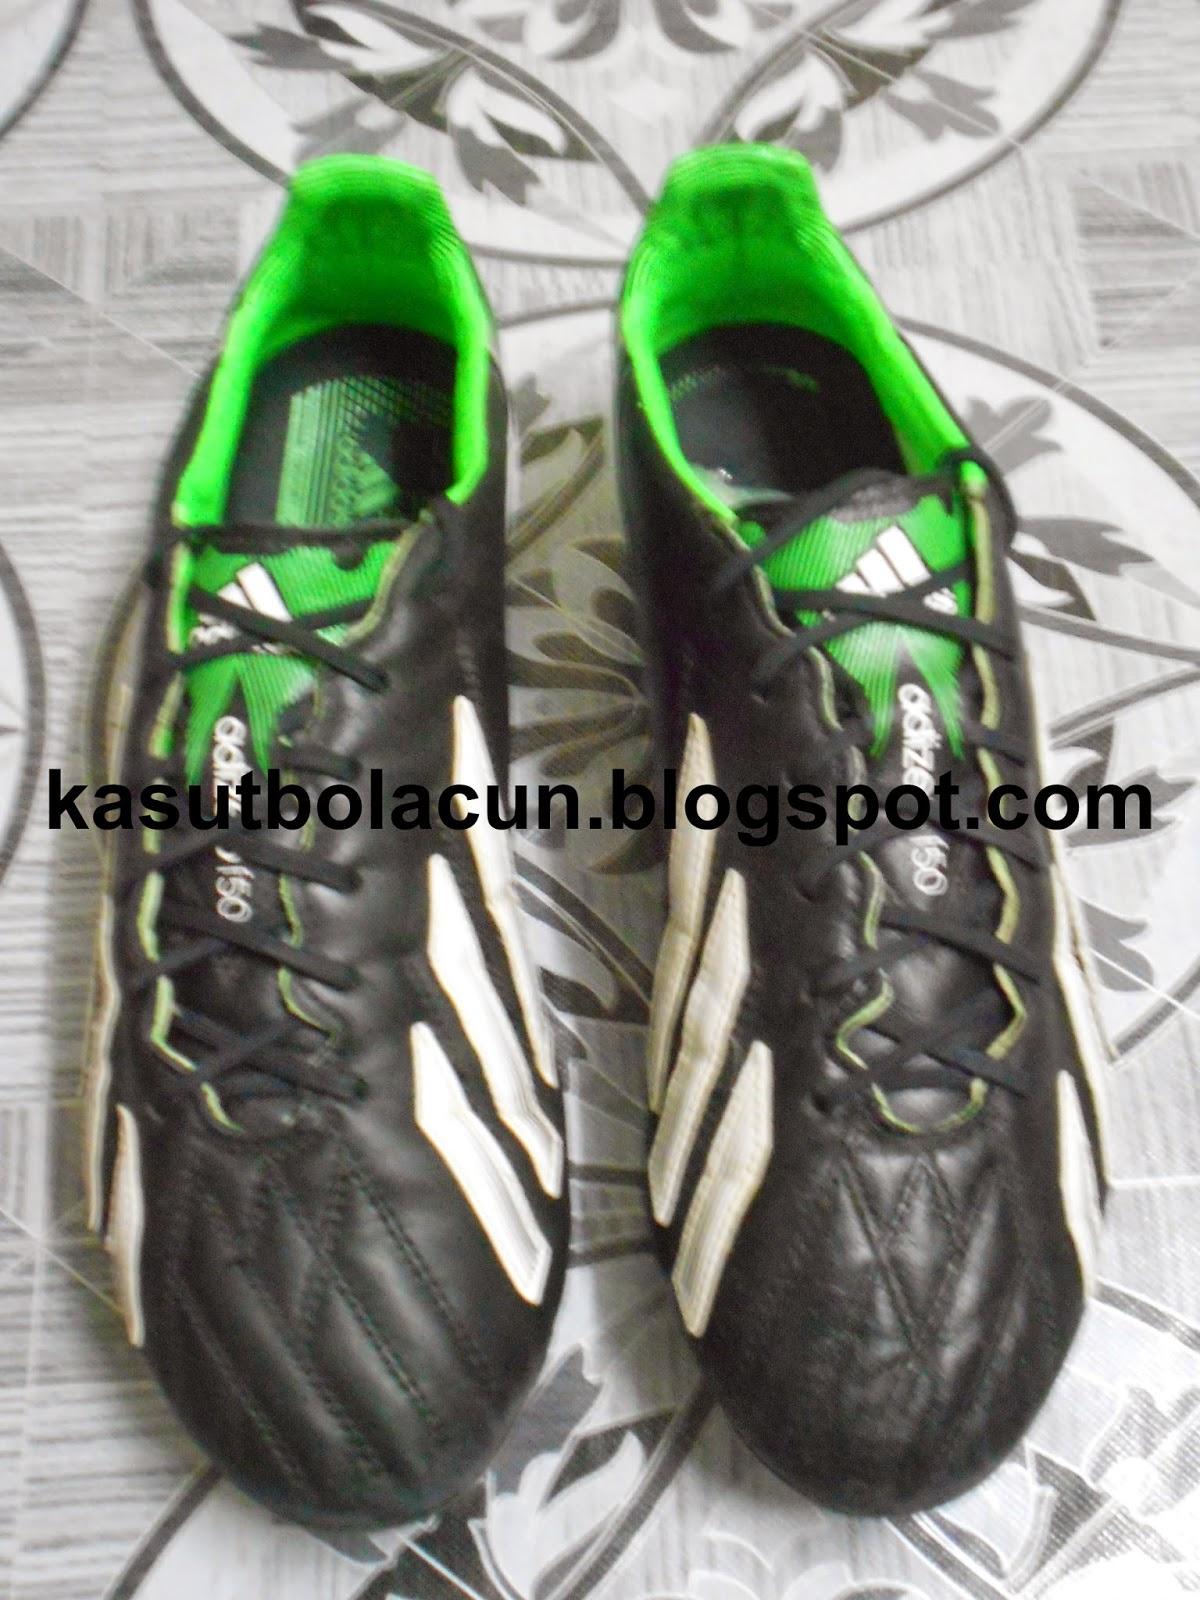 http://kasutbolacun.blogspot.com/2015/04/adidas-f50-adizero-micoach-2-sg.html